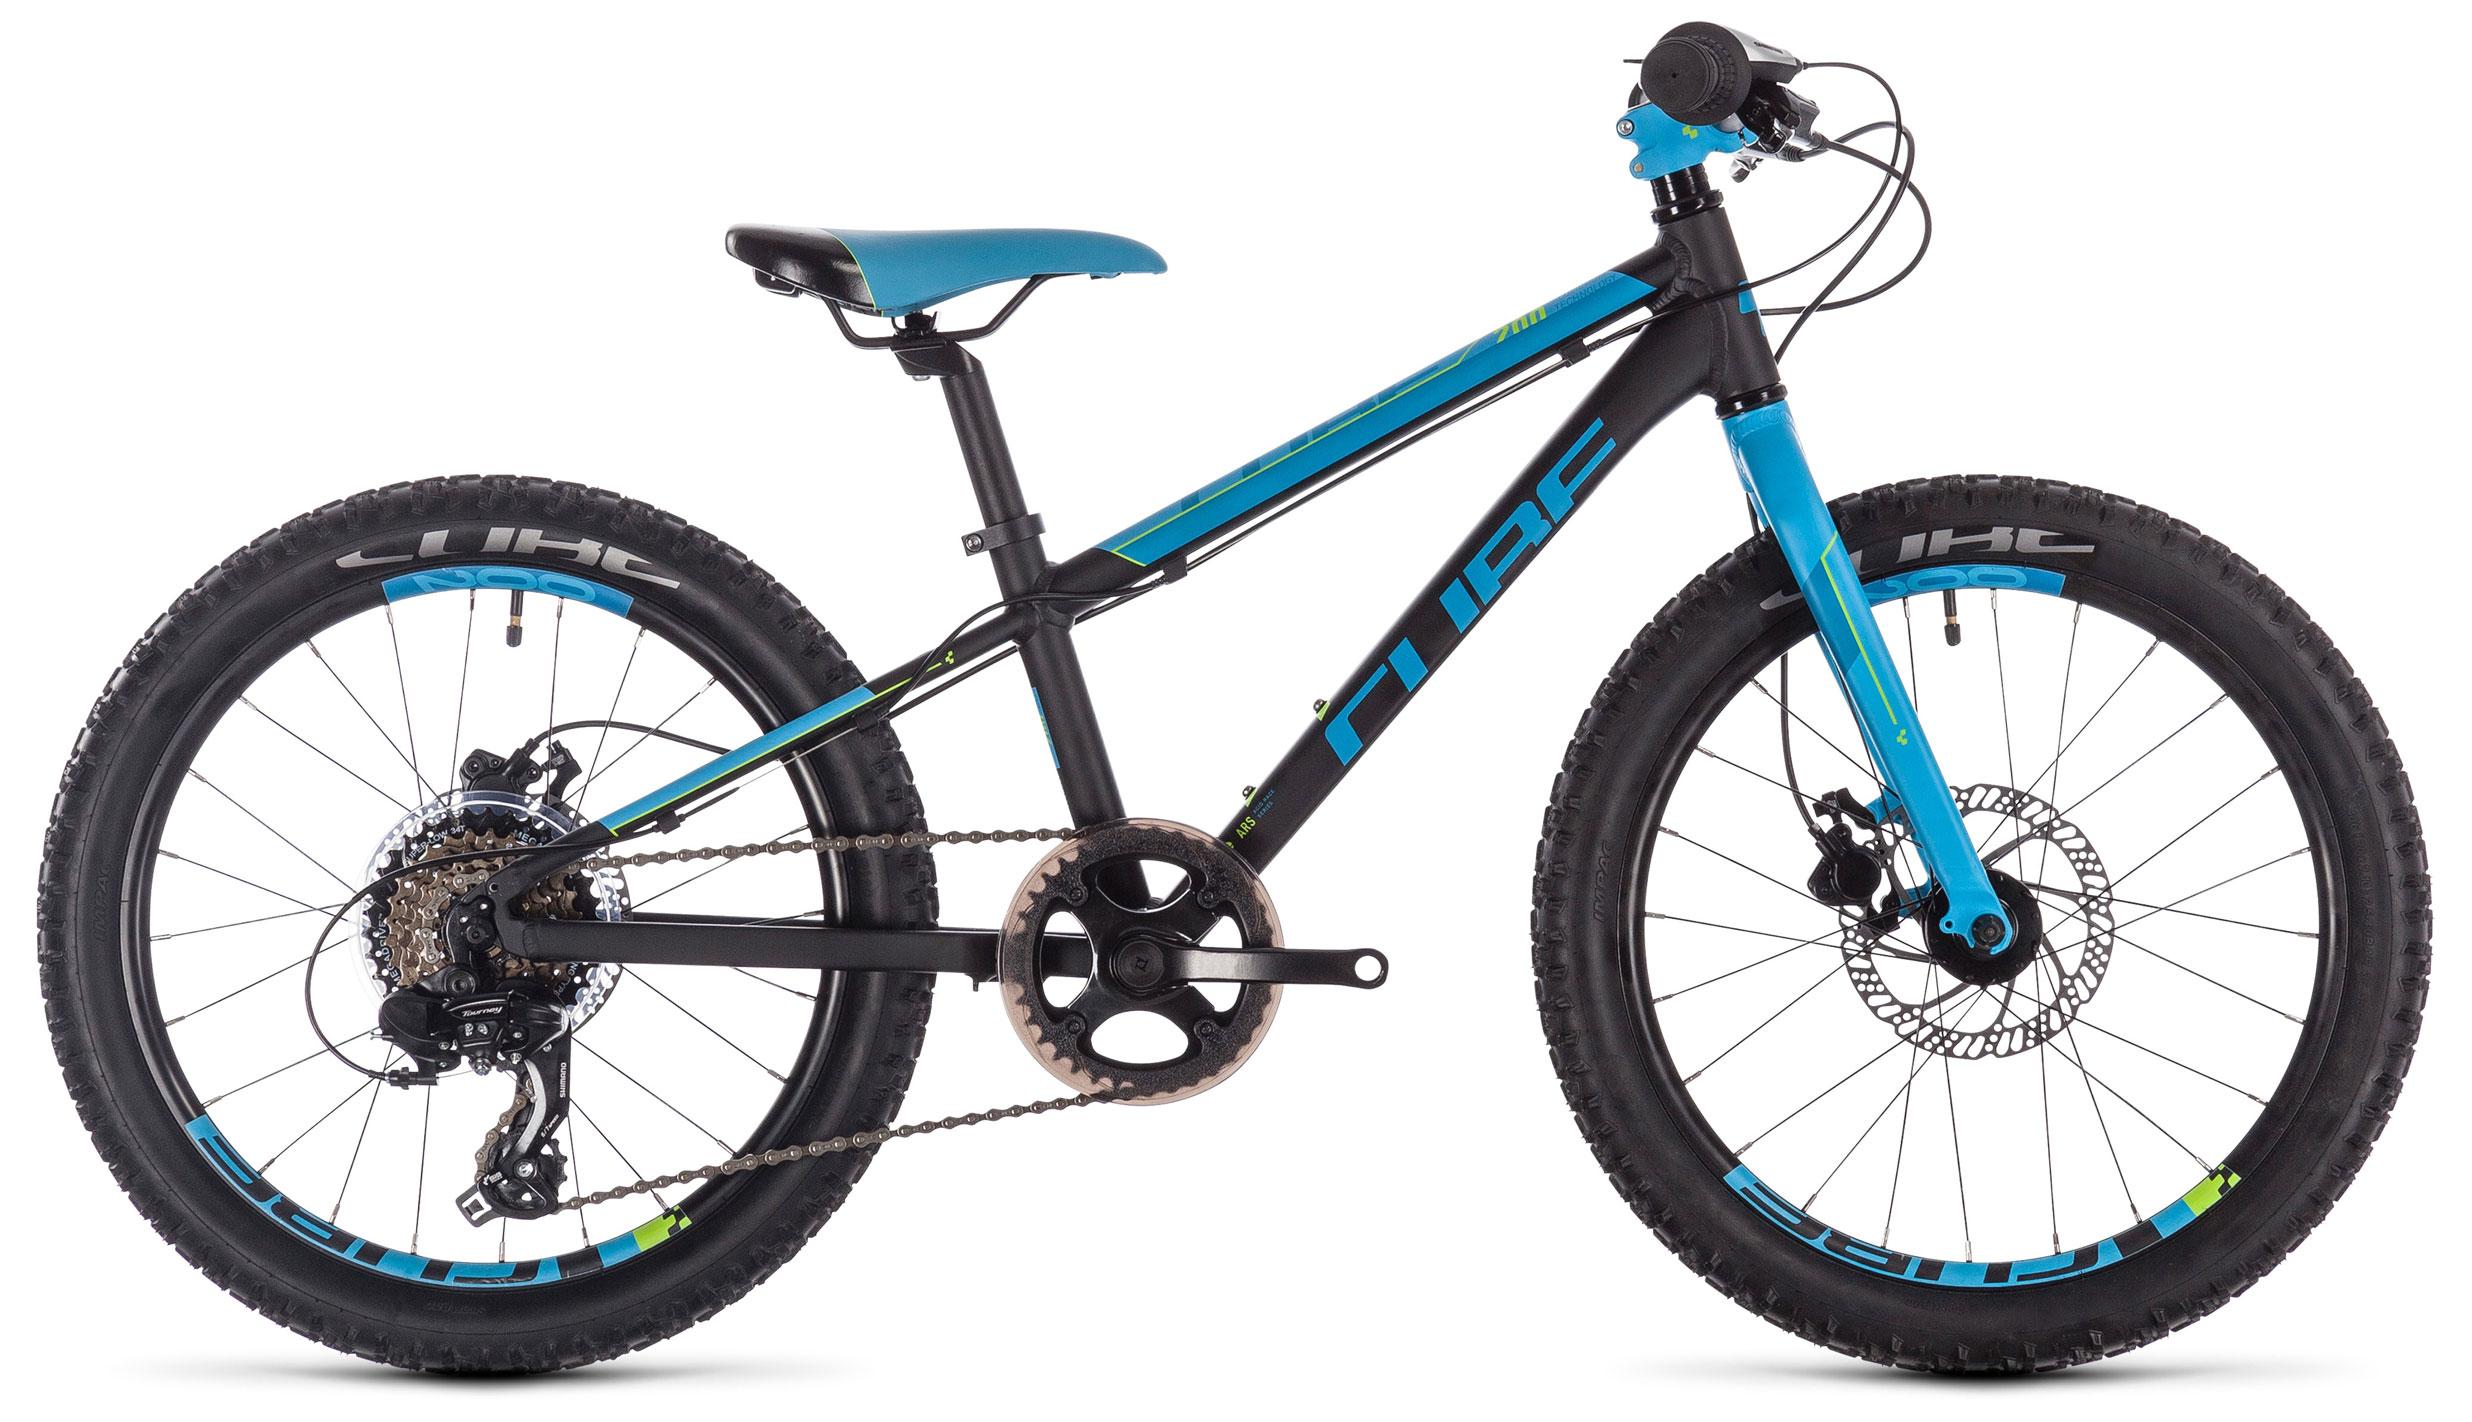 Велосипед Cube Acid 200 Disc 2019 велосипед cube attain pro disc 2018